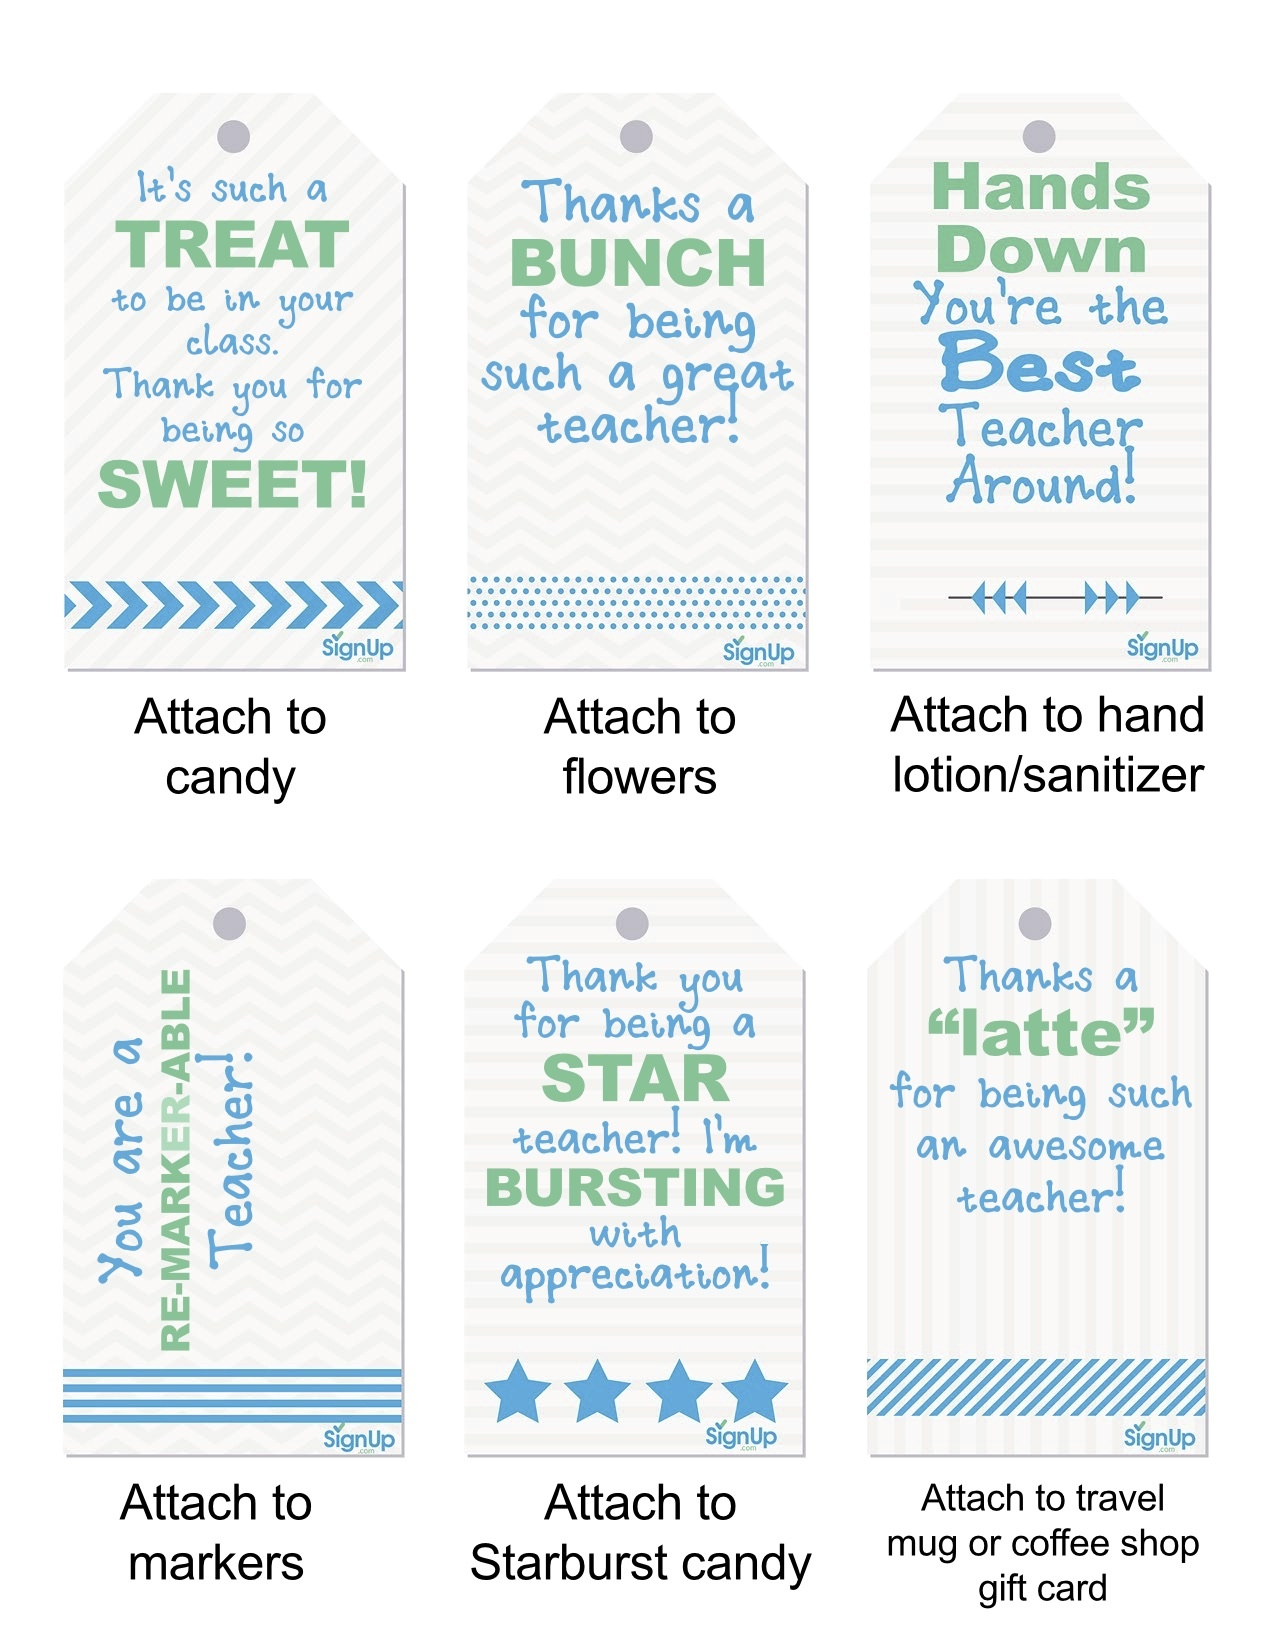 Free Teacher Appreciation Printables | Signup - Free Printable Tags For Teacher Appreciation